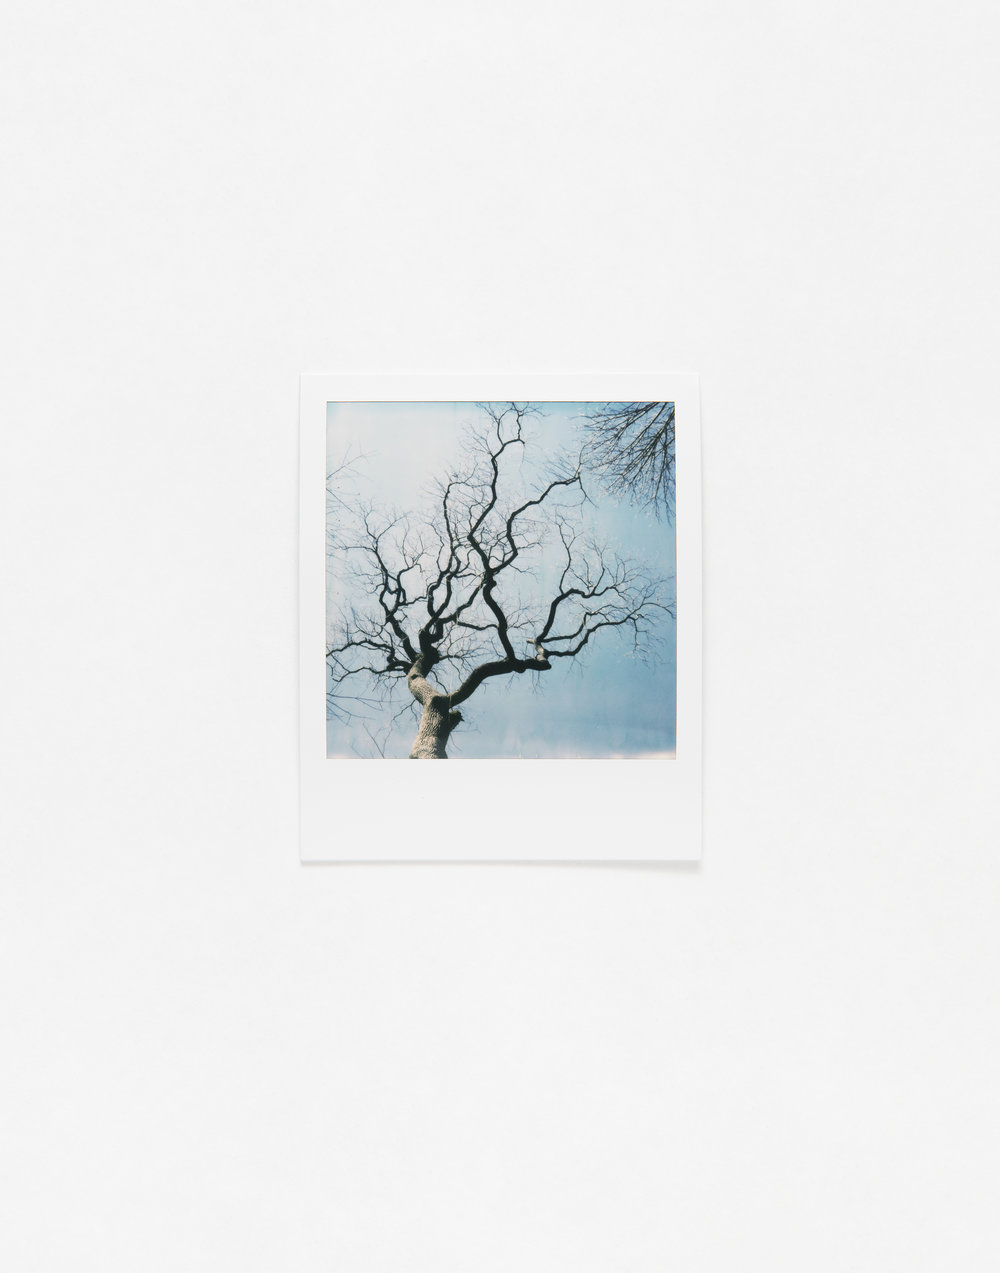 180331_Polaroid_0014.jpg